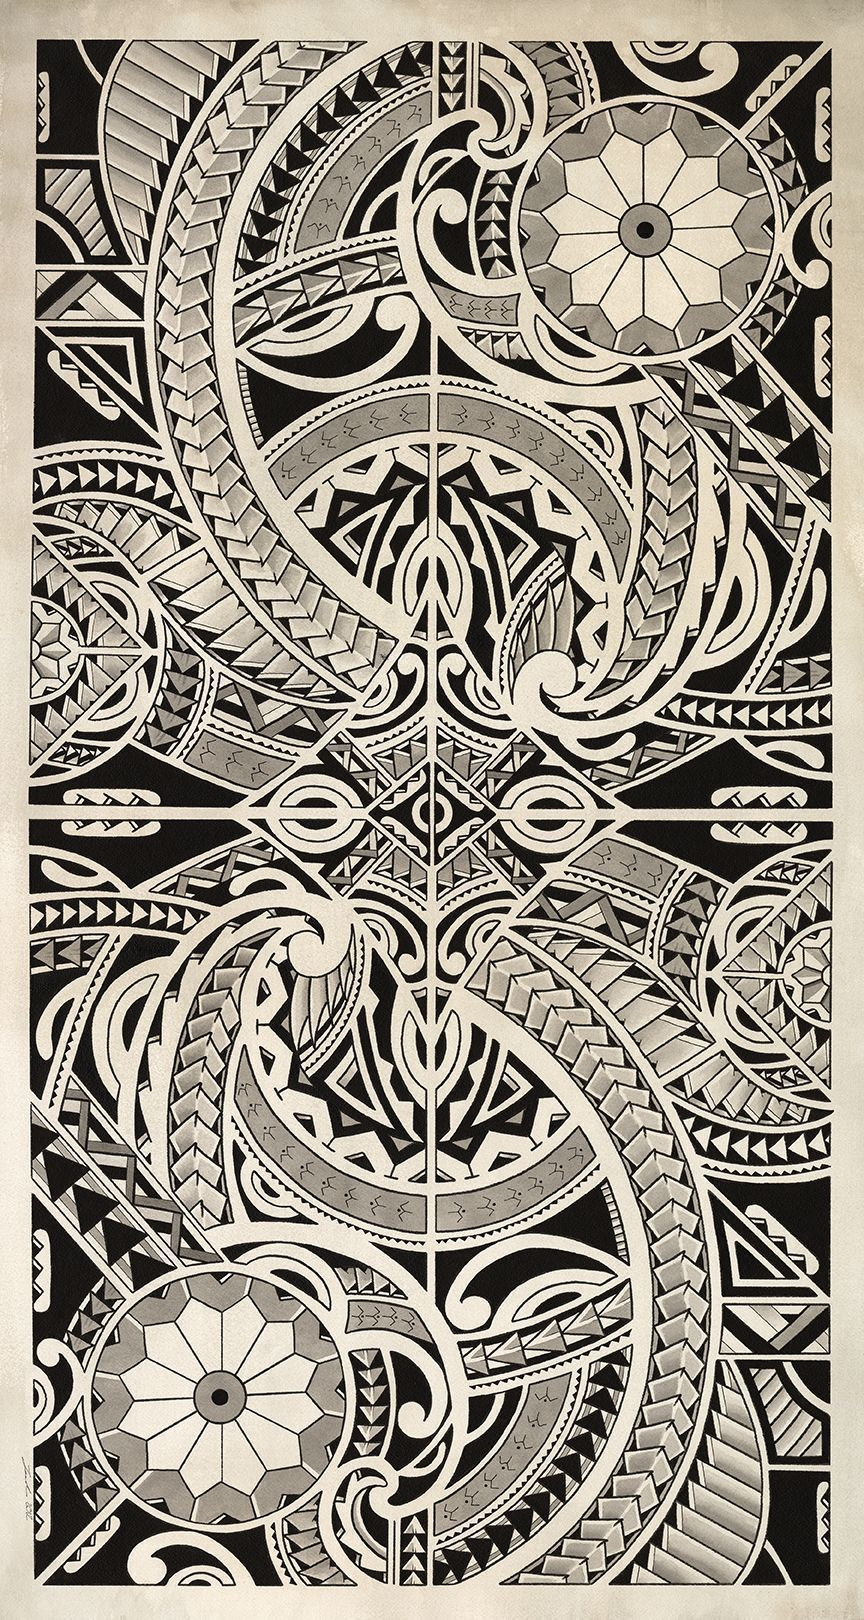 Polynesian Tribal Face Tattoos Google Search Maoritattoosface Tatuagem Maori Maori Tatuagem No Rosto